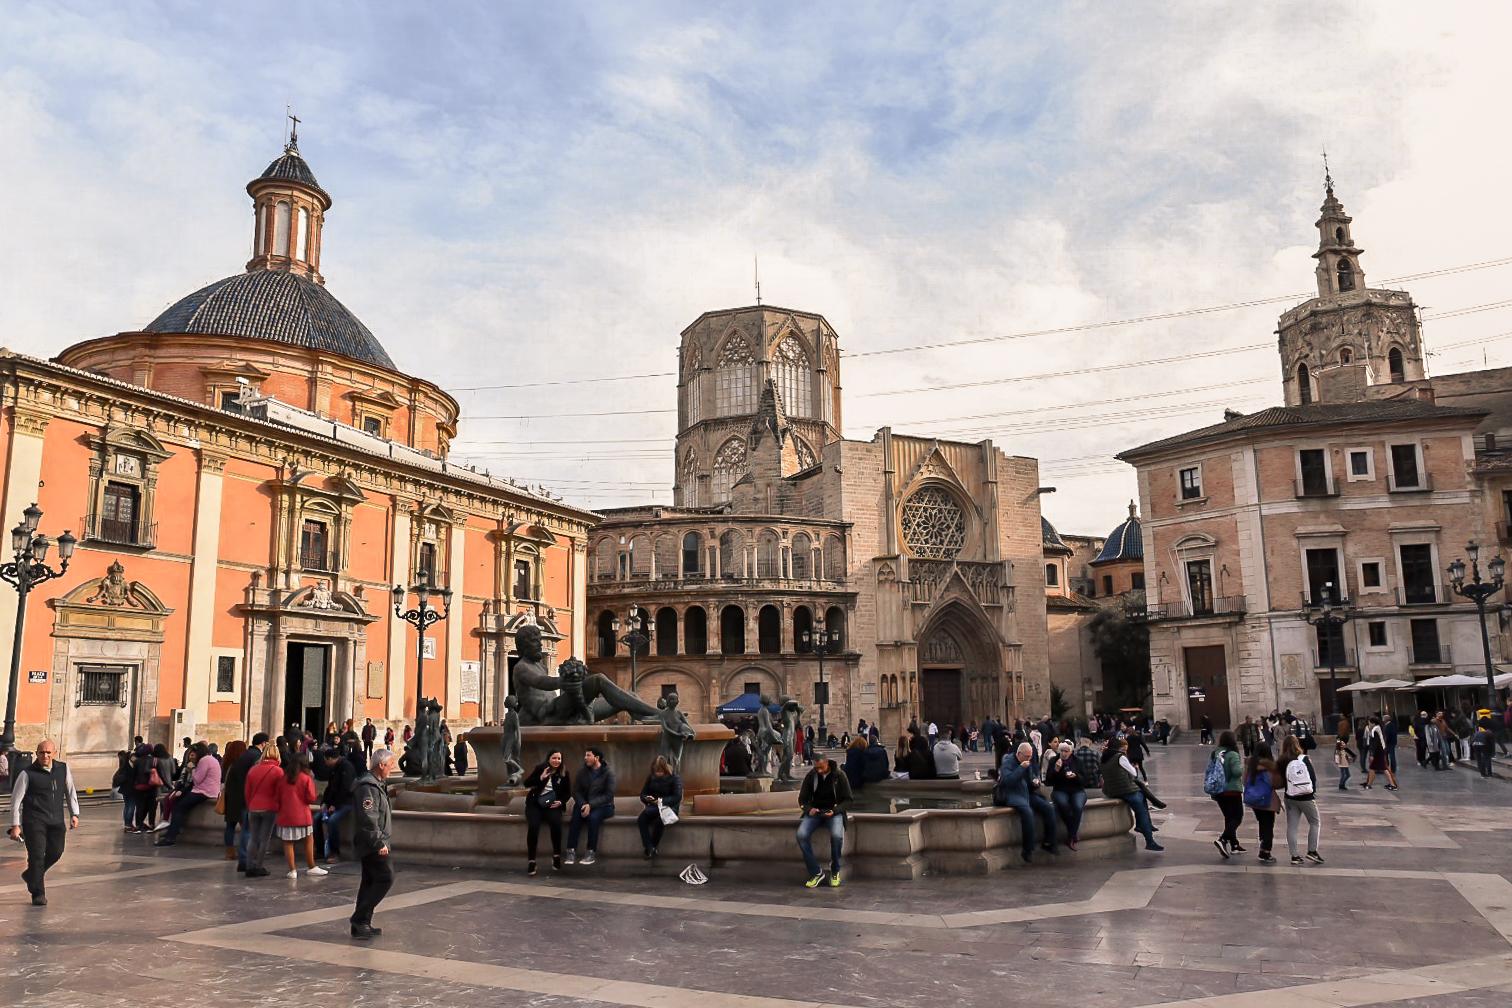 Plaza de la Virgen, Valencia - by Ben Holbrook